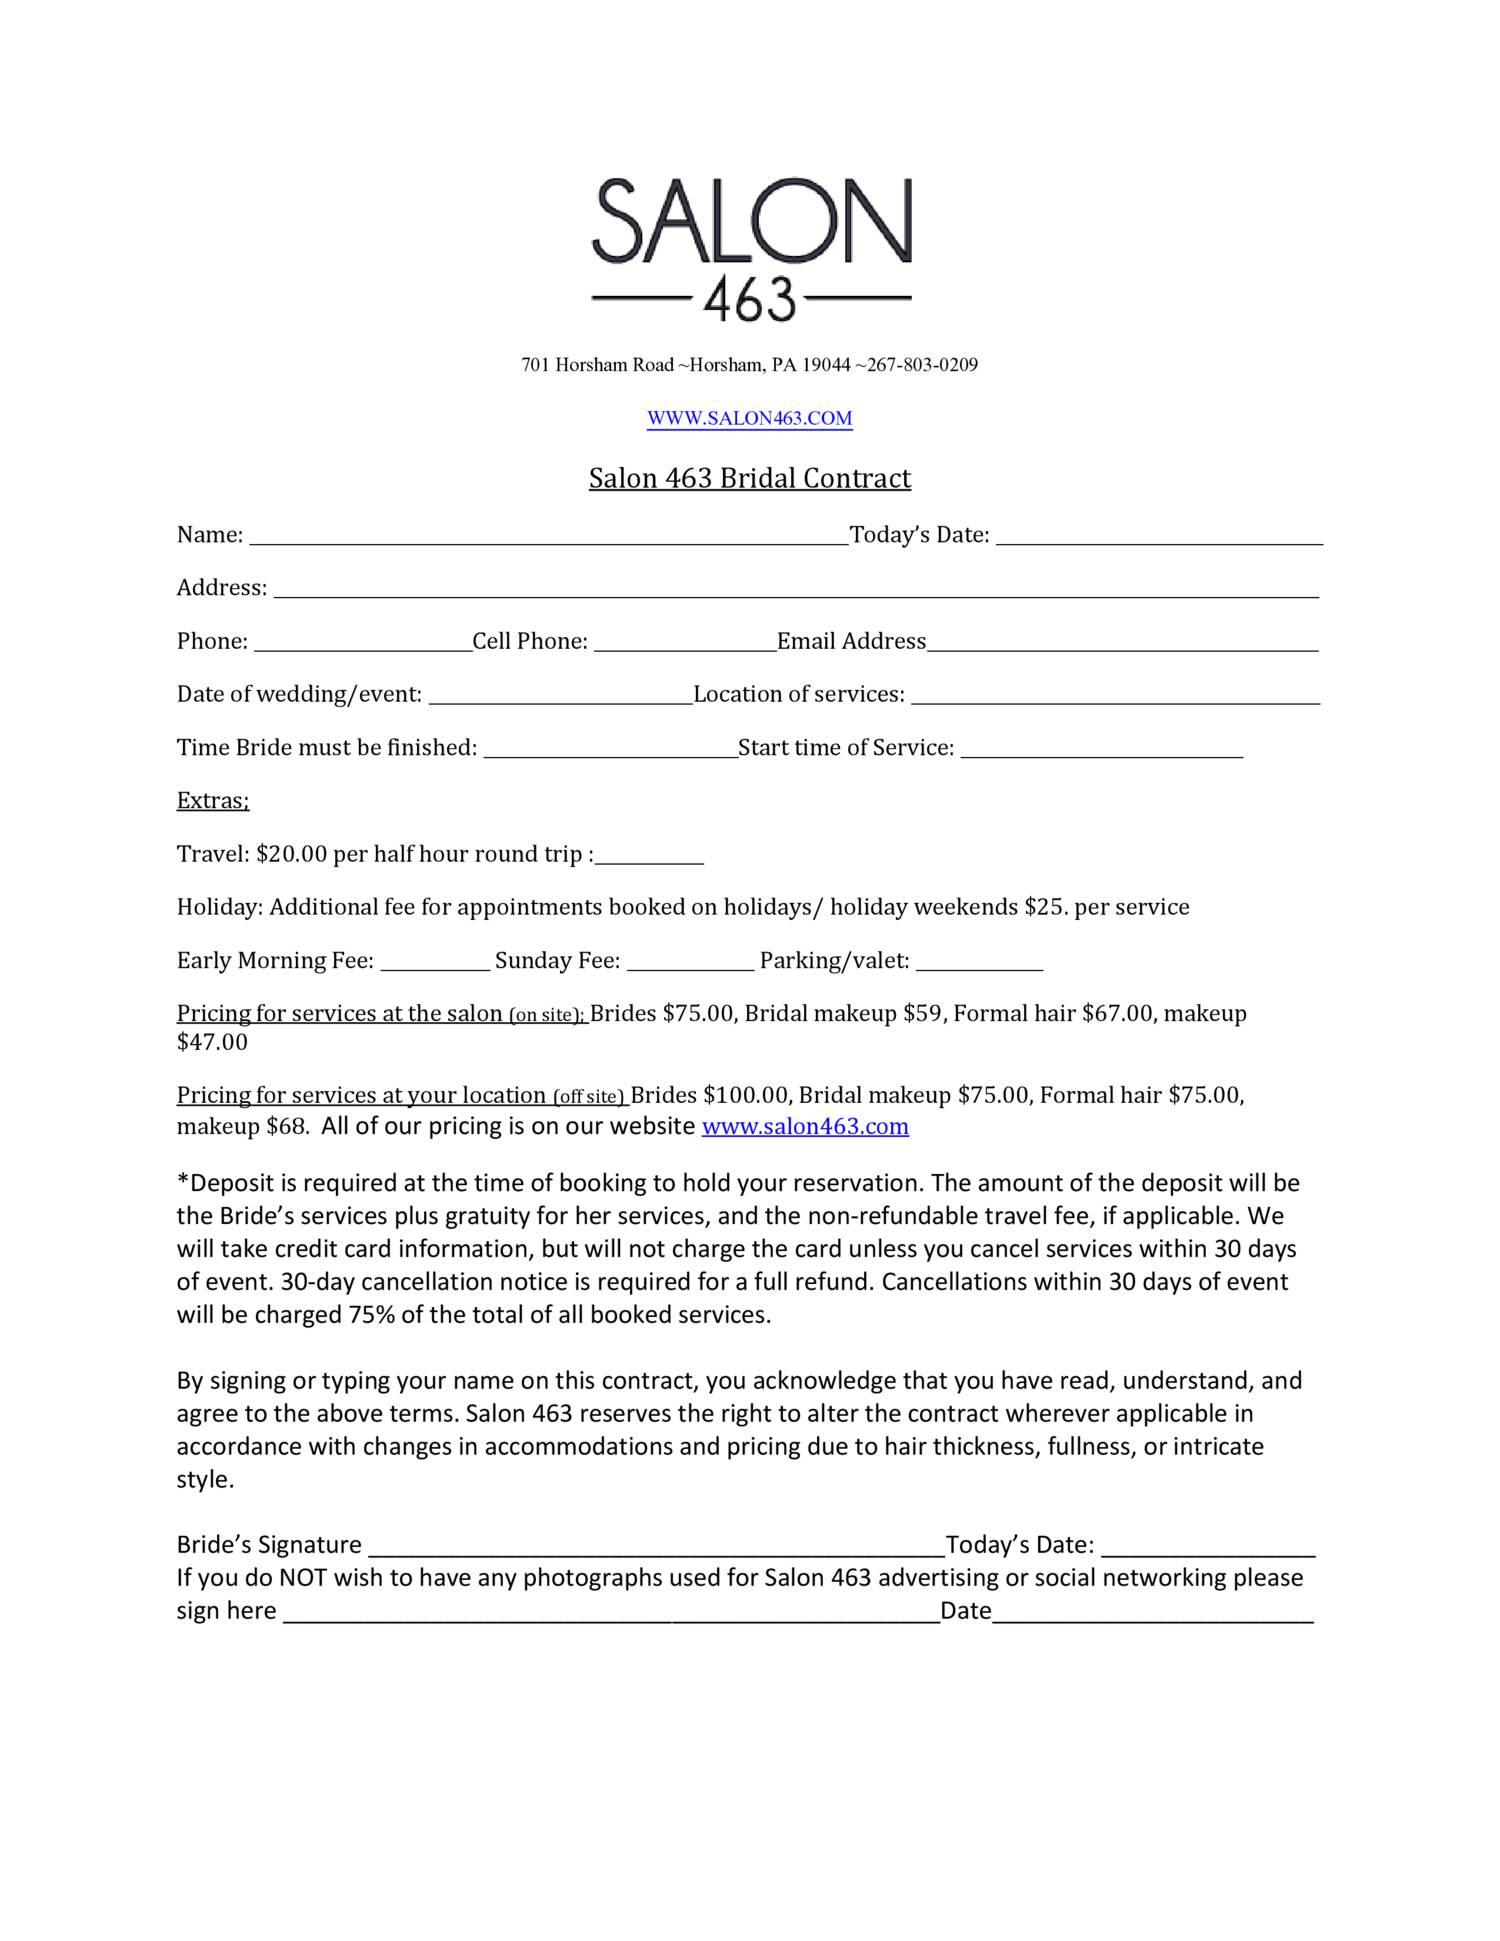 Salon463 bridal contractcx docdroid altavistaventures Gallery